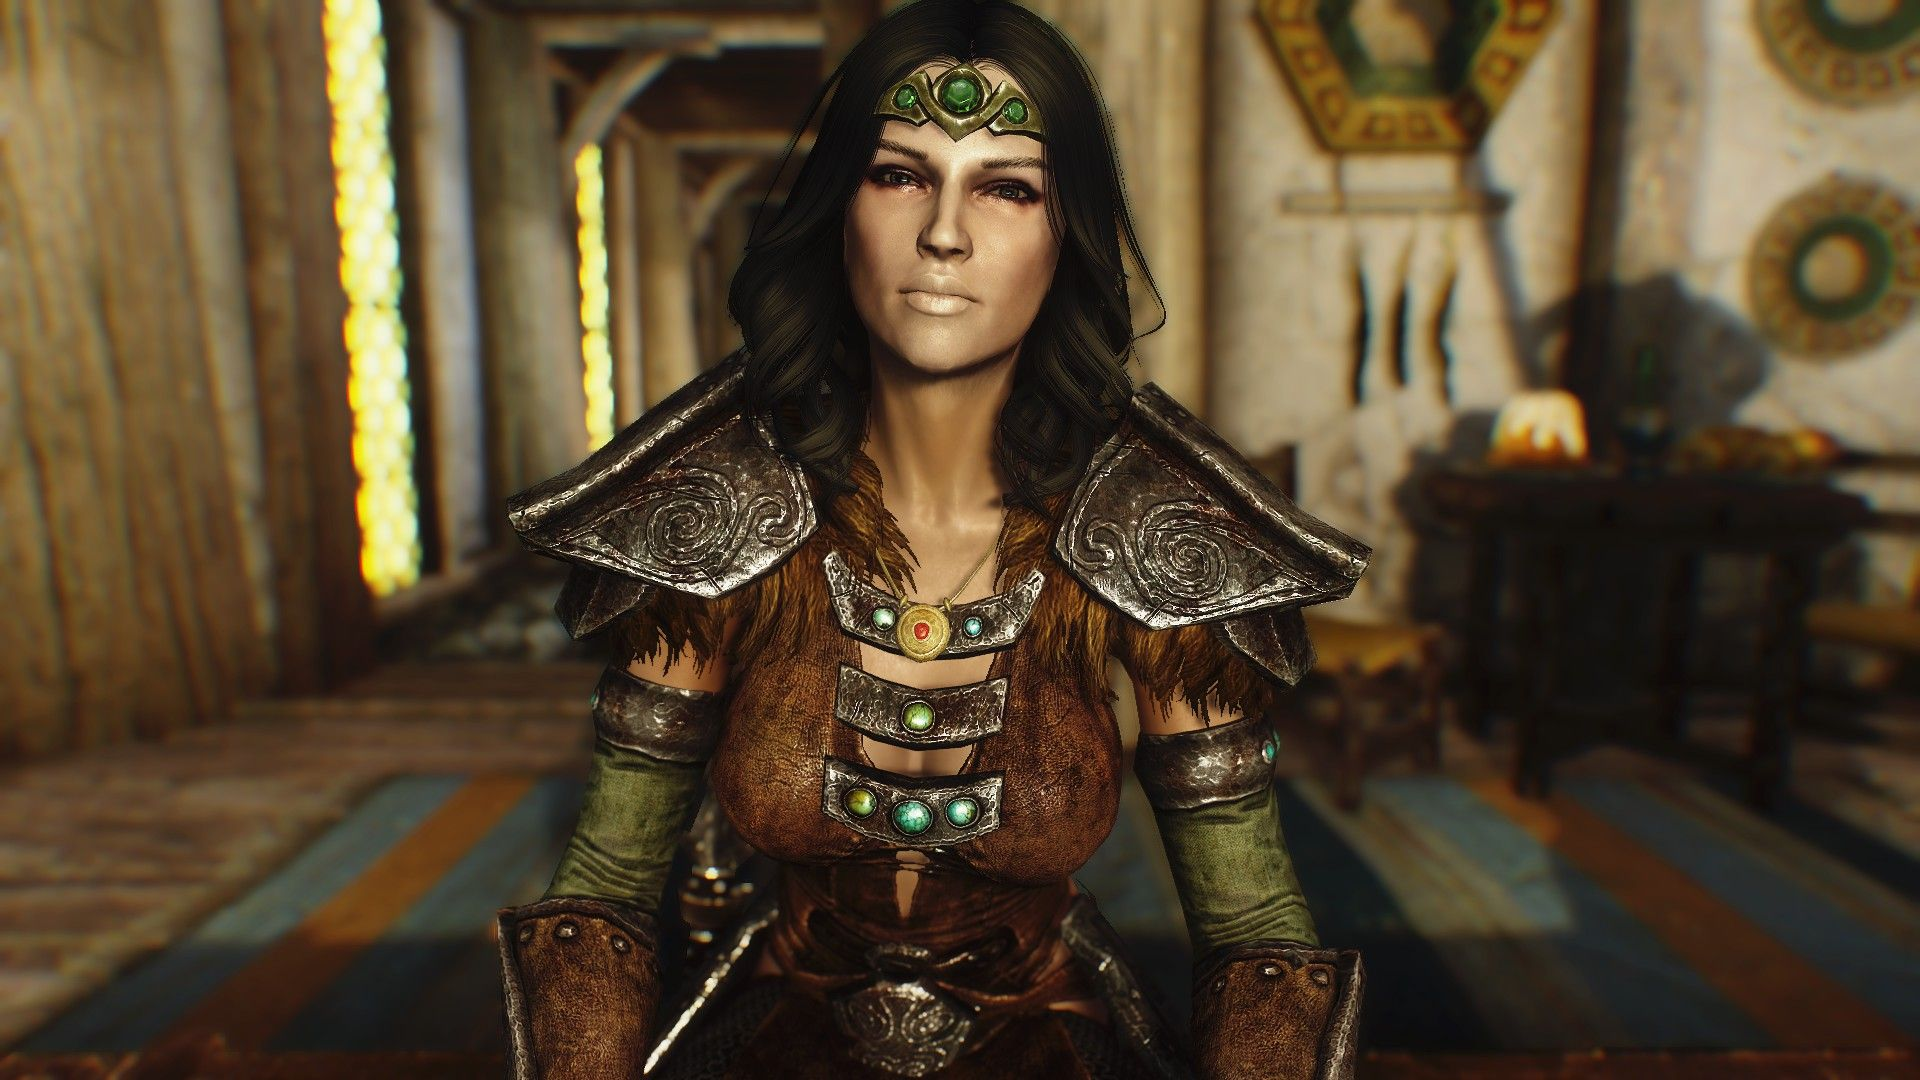 Lydia, housecarl of Skyrim (mod) | Character inspiration